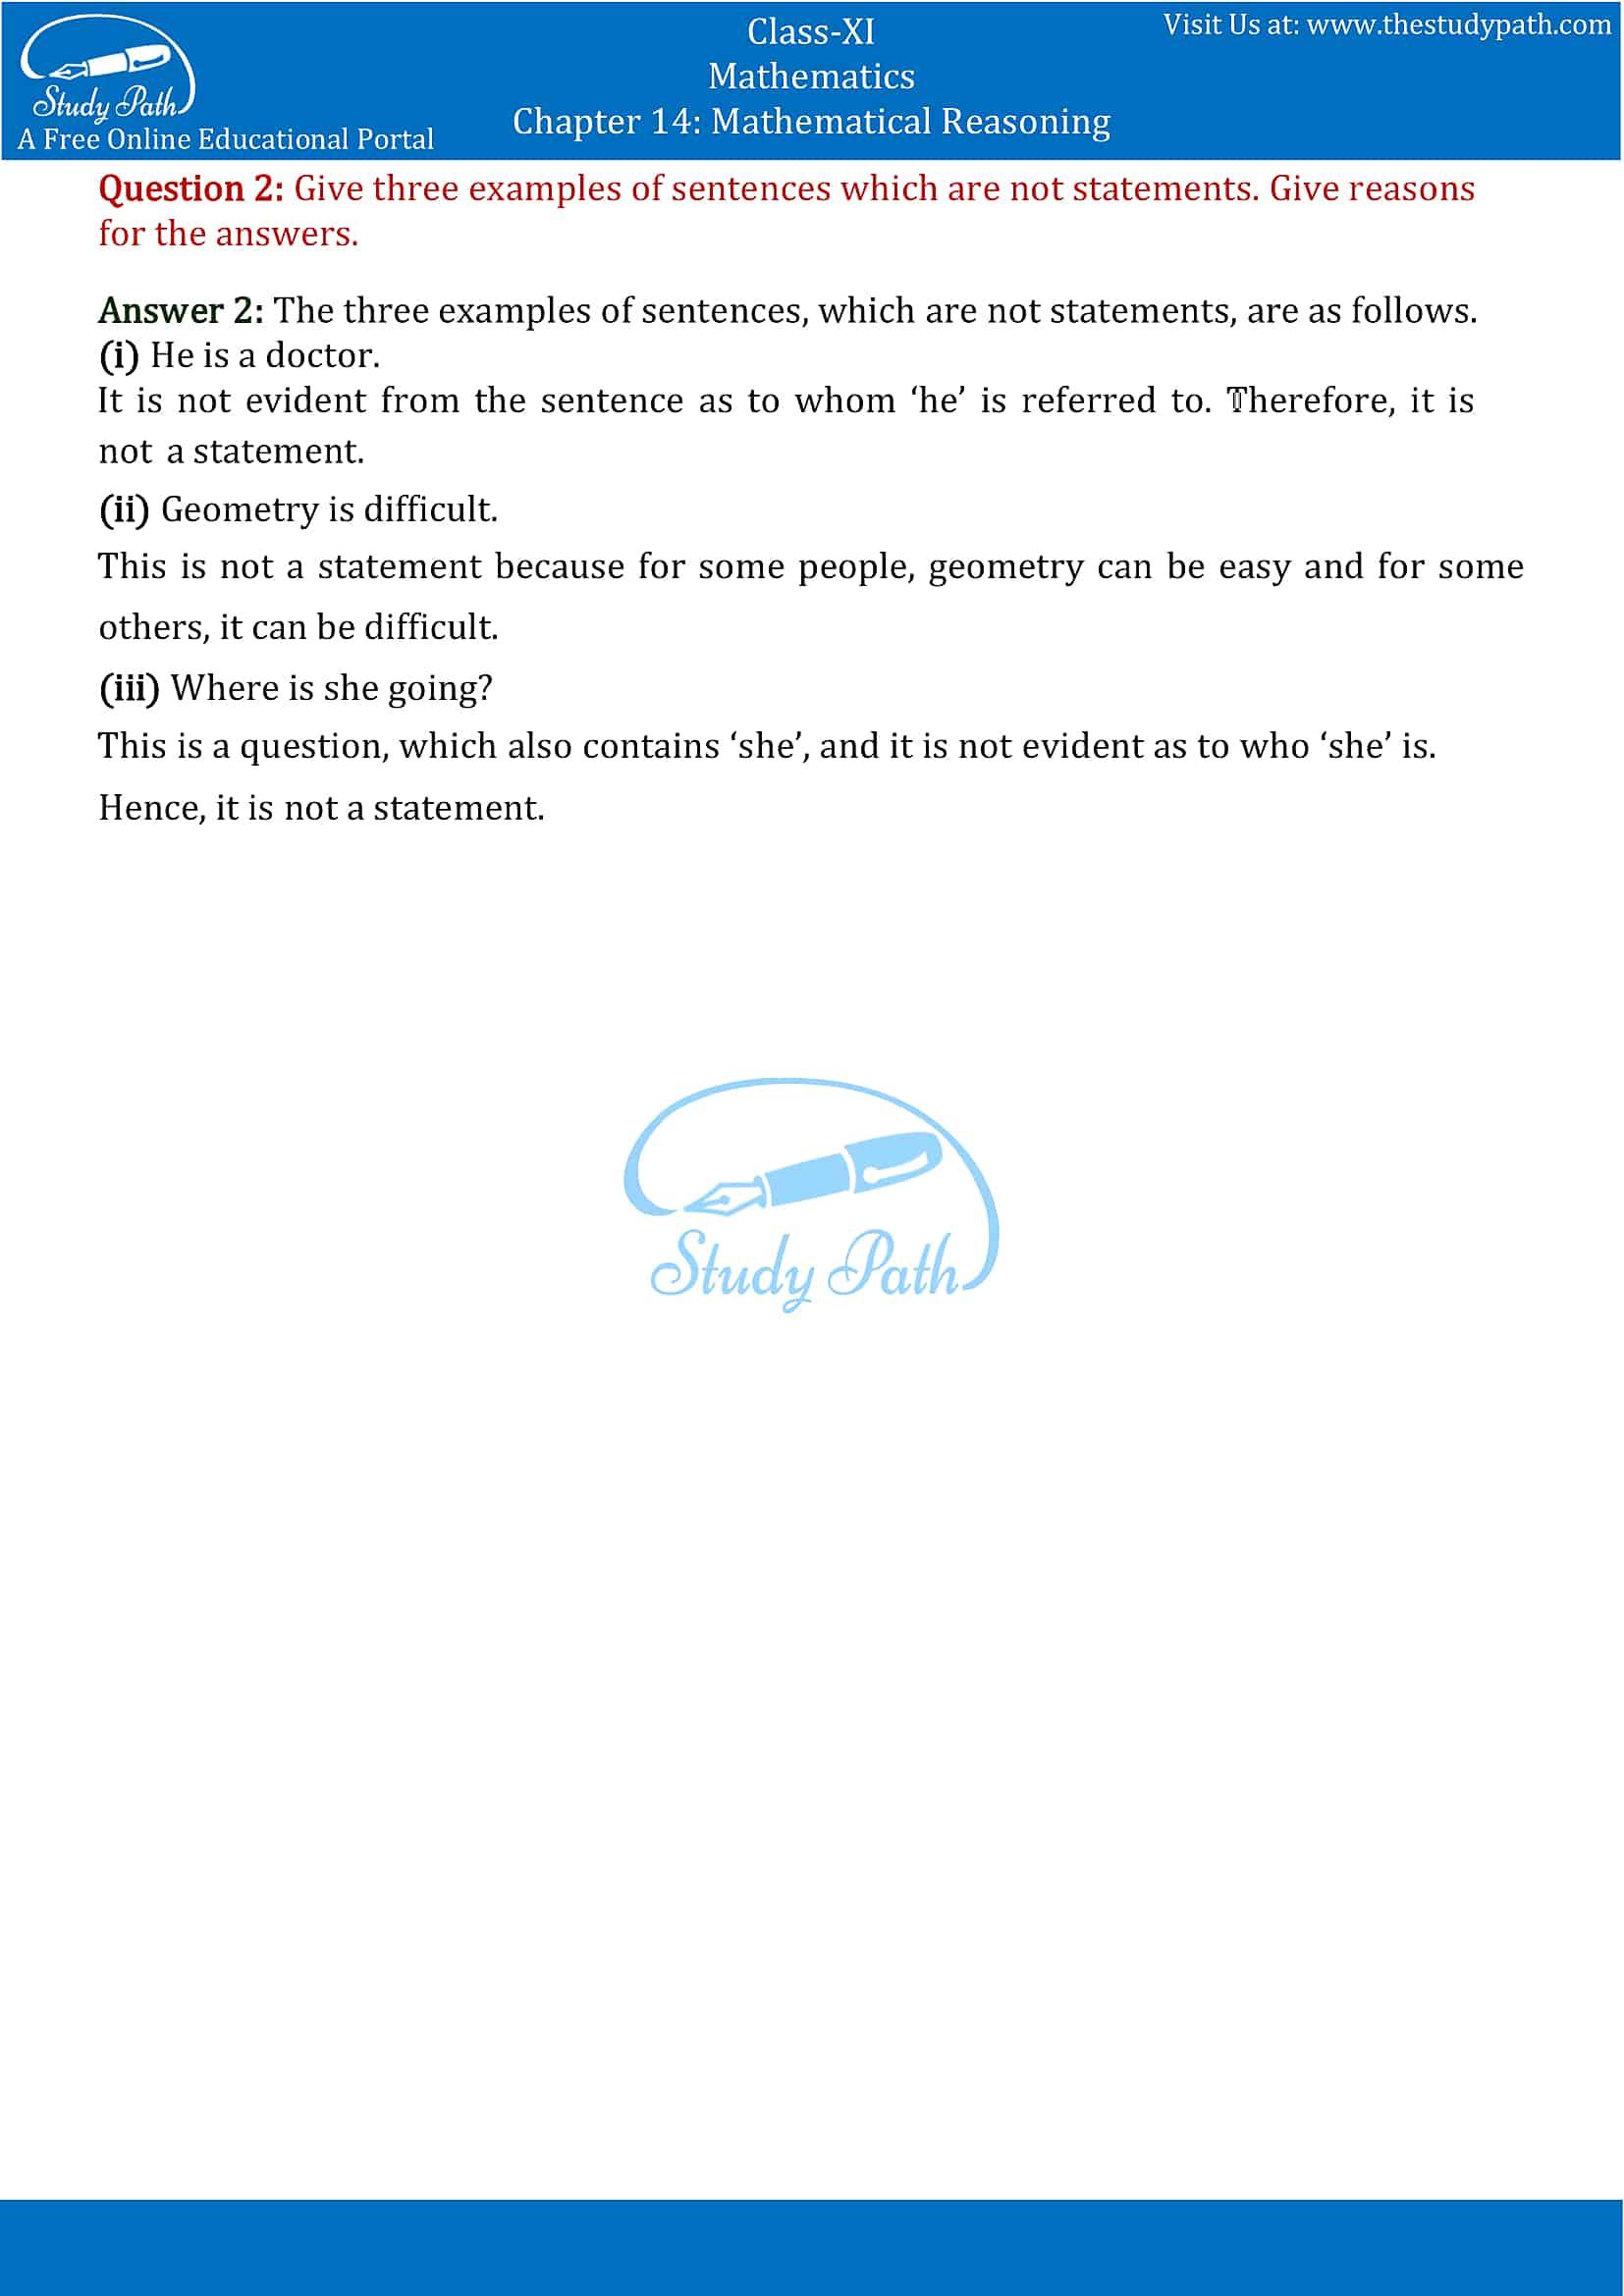 NCERT Solutions for Class 11 Maths chapter 14 Mathematical Reasoning Part 2